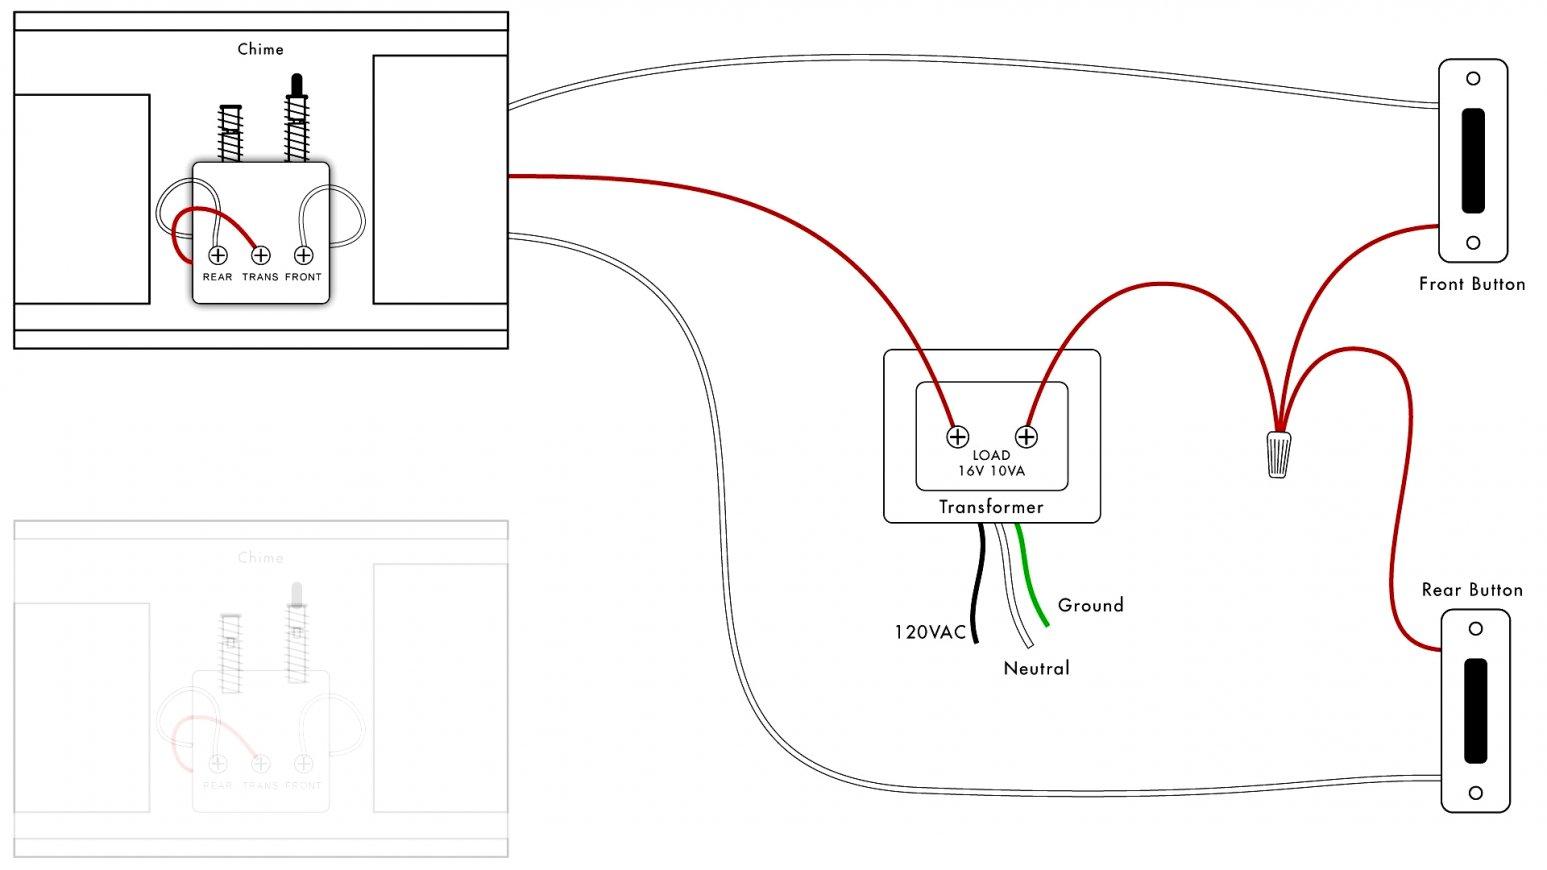 Pool Light Transformer Wiring Diagram - Trusted Wiring Diagram Online - Pool Light Wiring Diagram